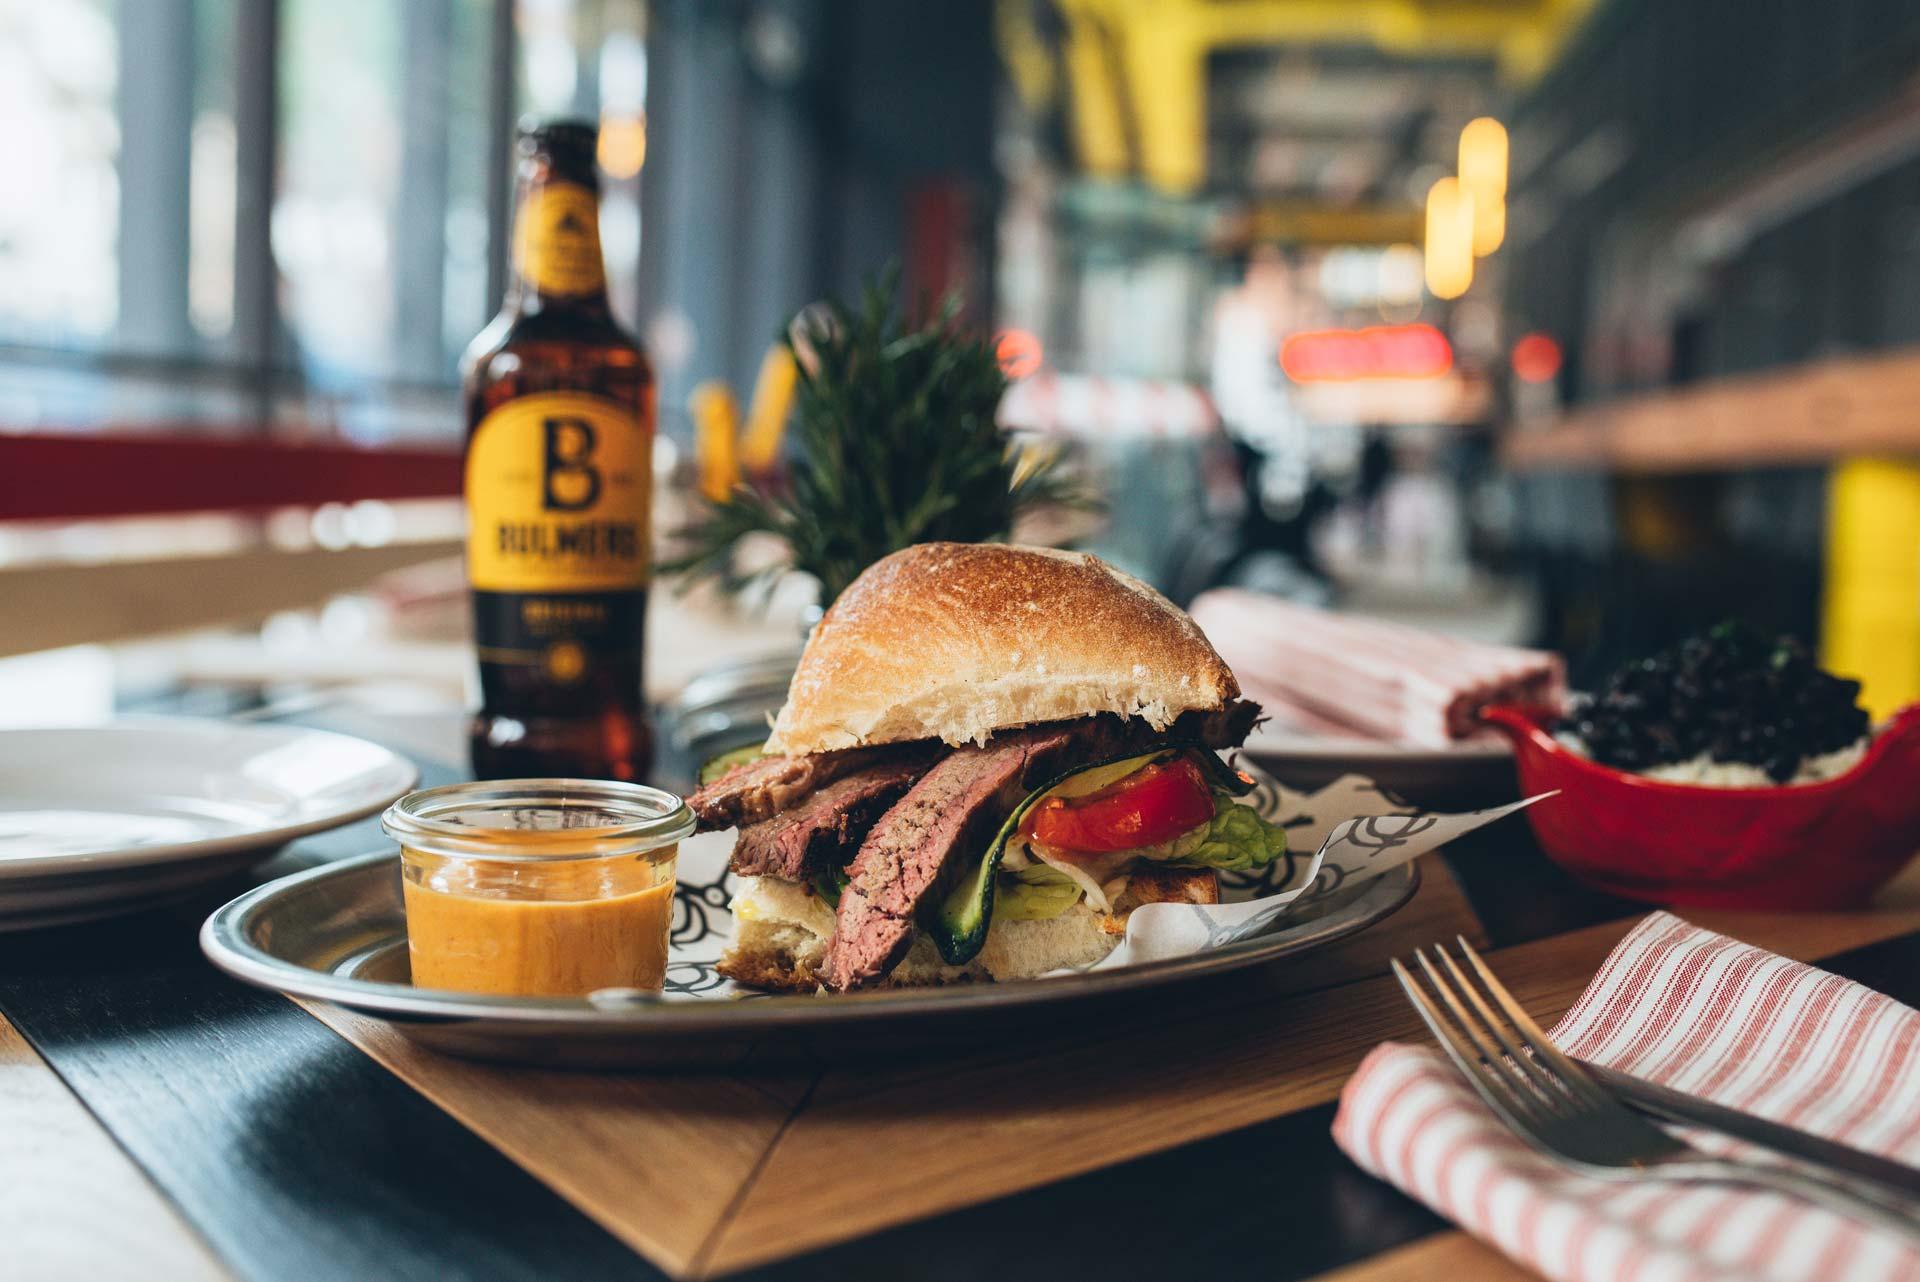 Mejores hamburguesas Madrid - Limbo